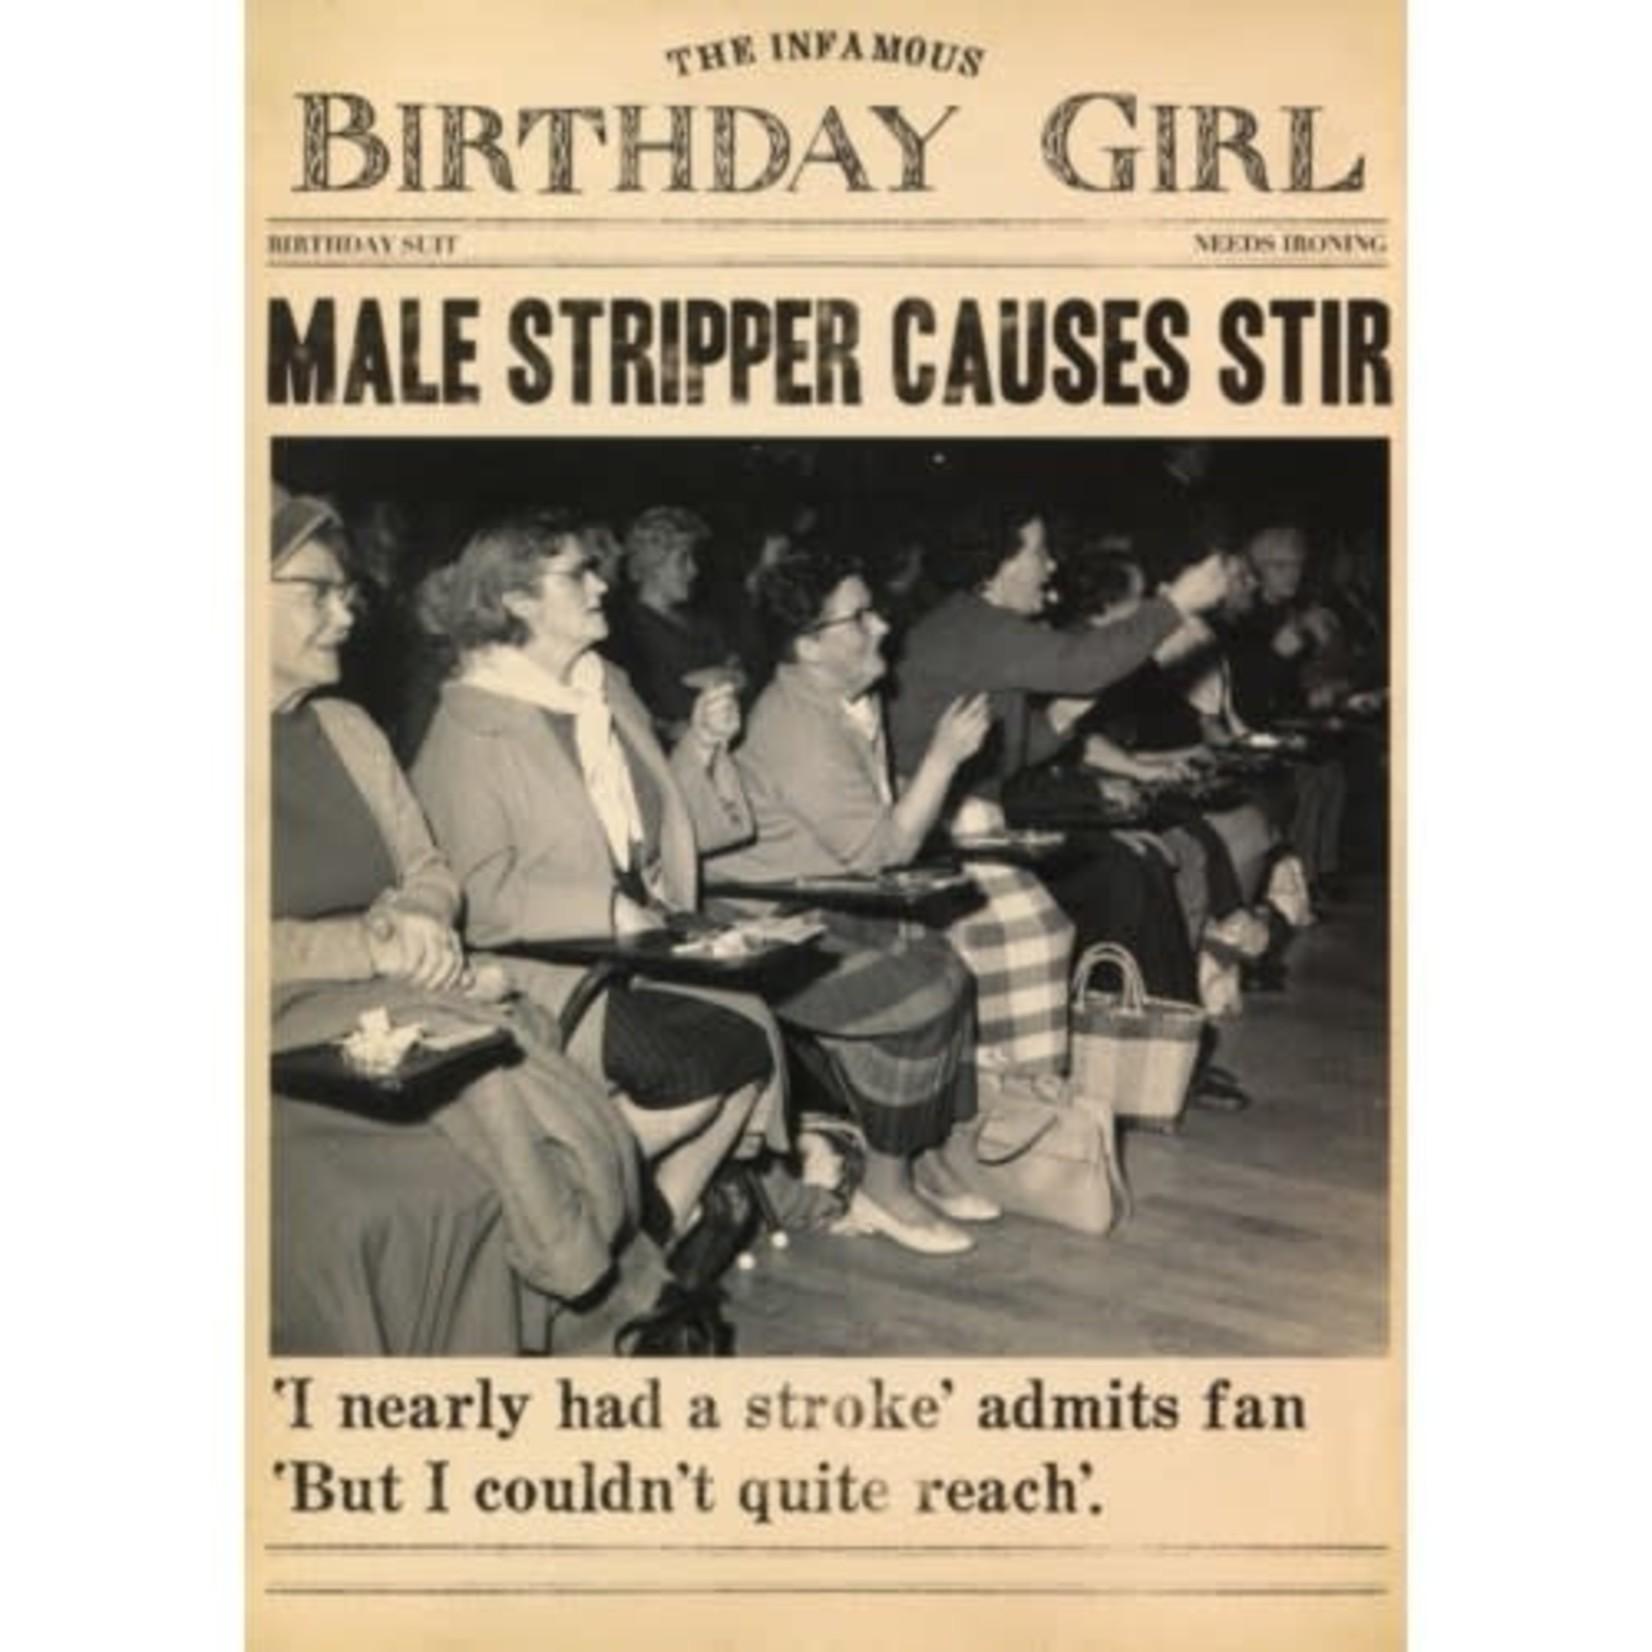 MALE STRIPPER CAUSES STIR CARD